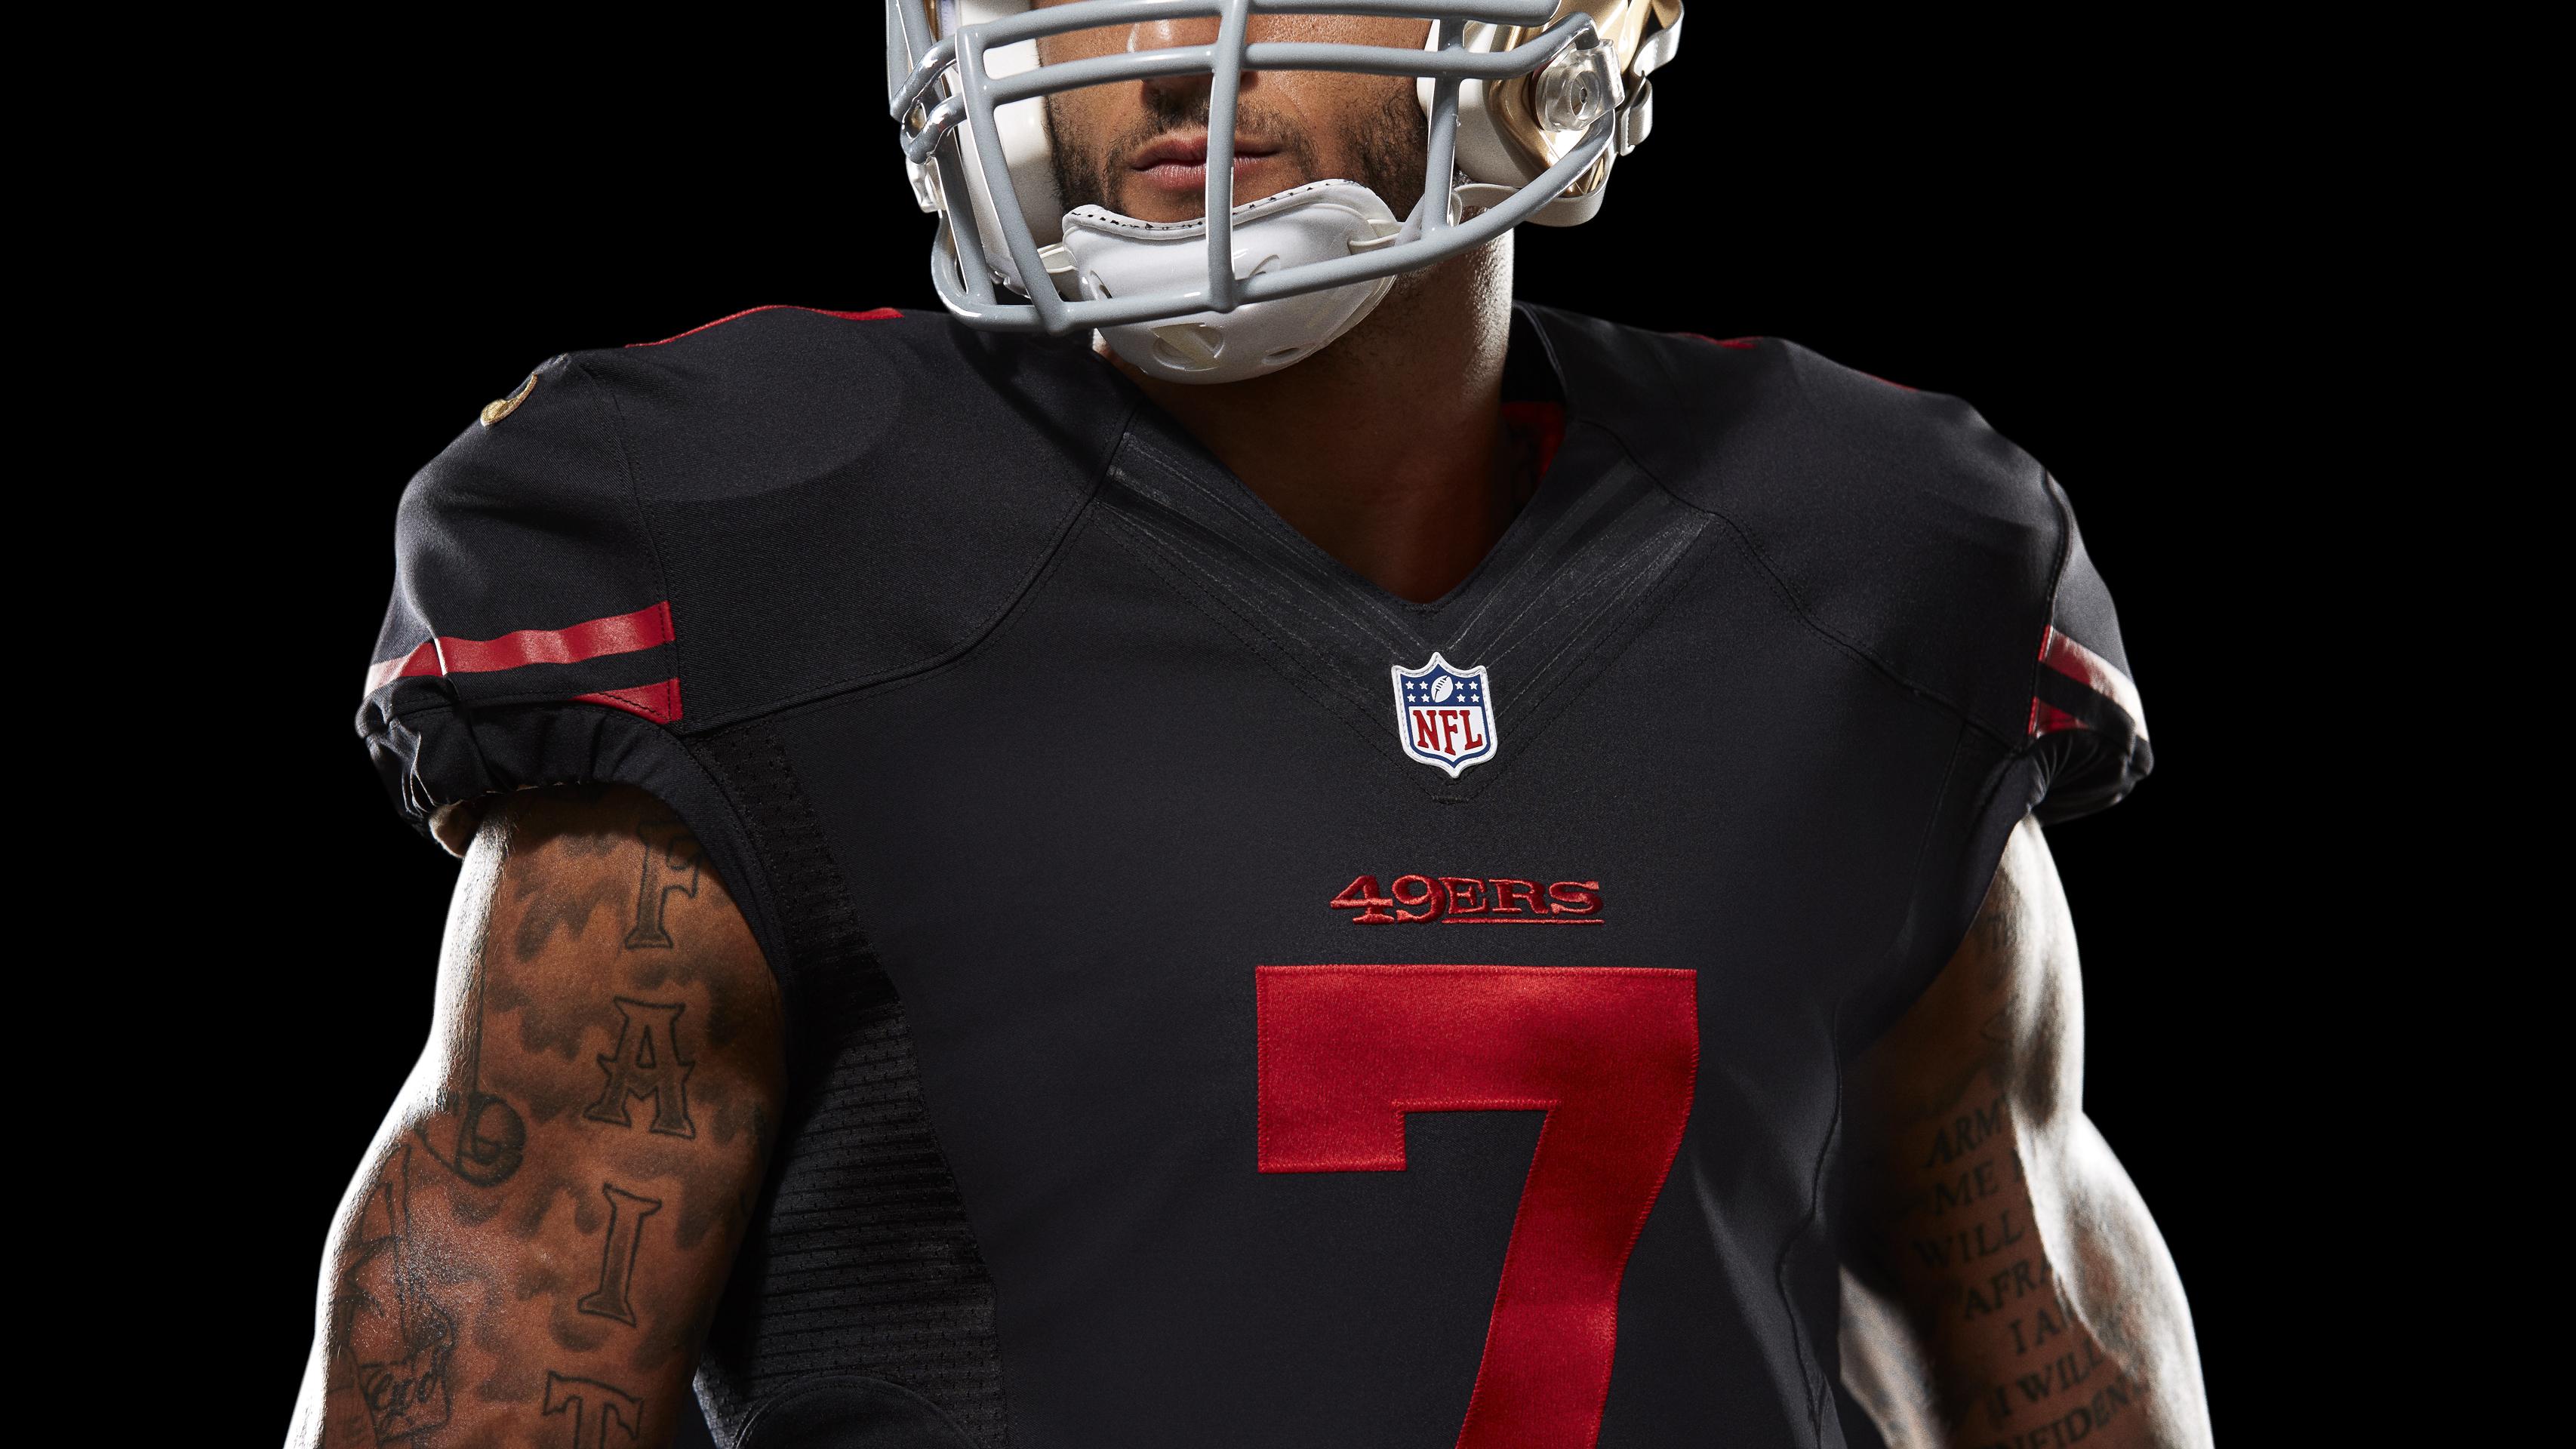 online retailer a4dc8 ddfbb San Francisco 49ers Get New All-Black Alternate Uniforms ...